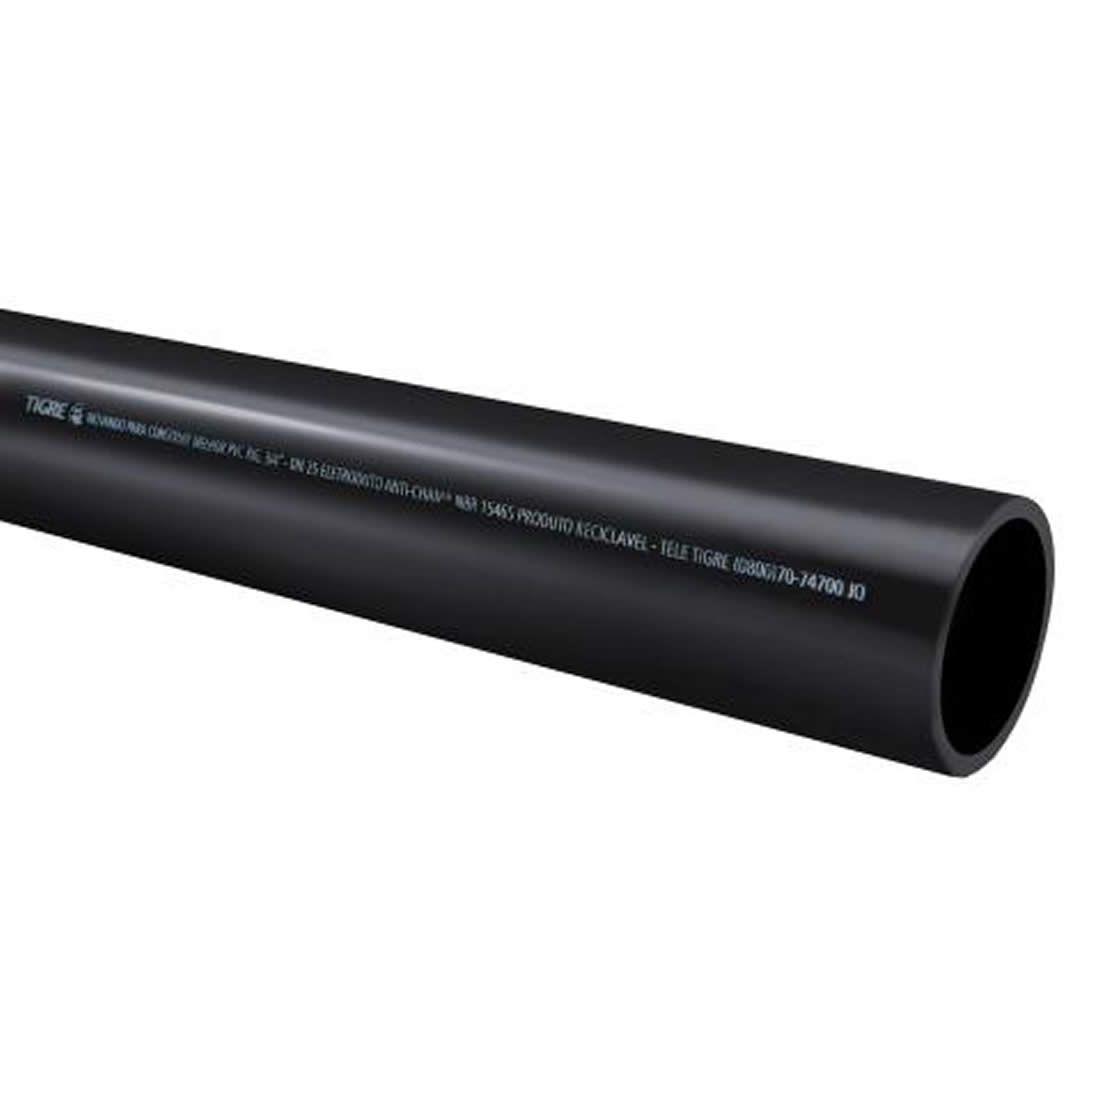 Tubo Eletroduto Soldável Antichama 25mm X 3 Metros Tigre